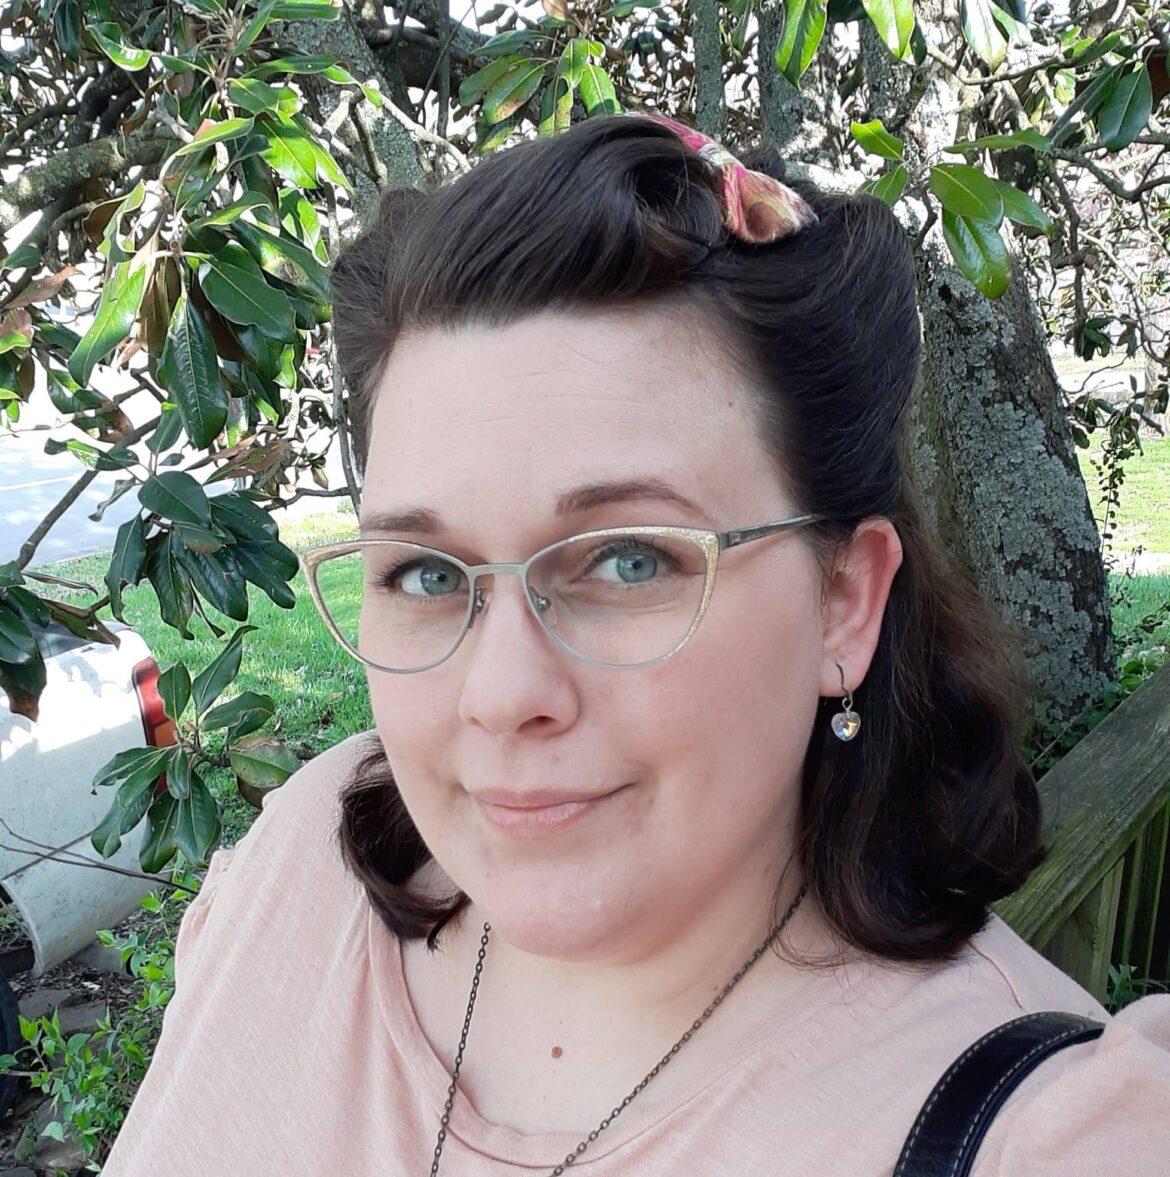 Mandy Collins Joins Geeky KOOL Staff